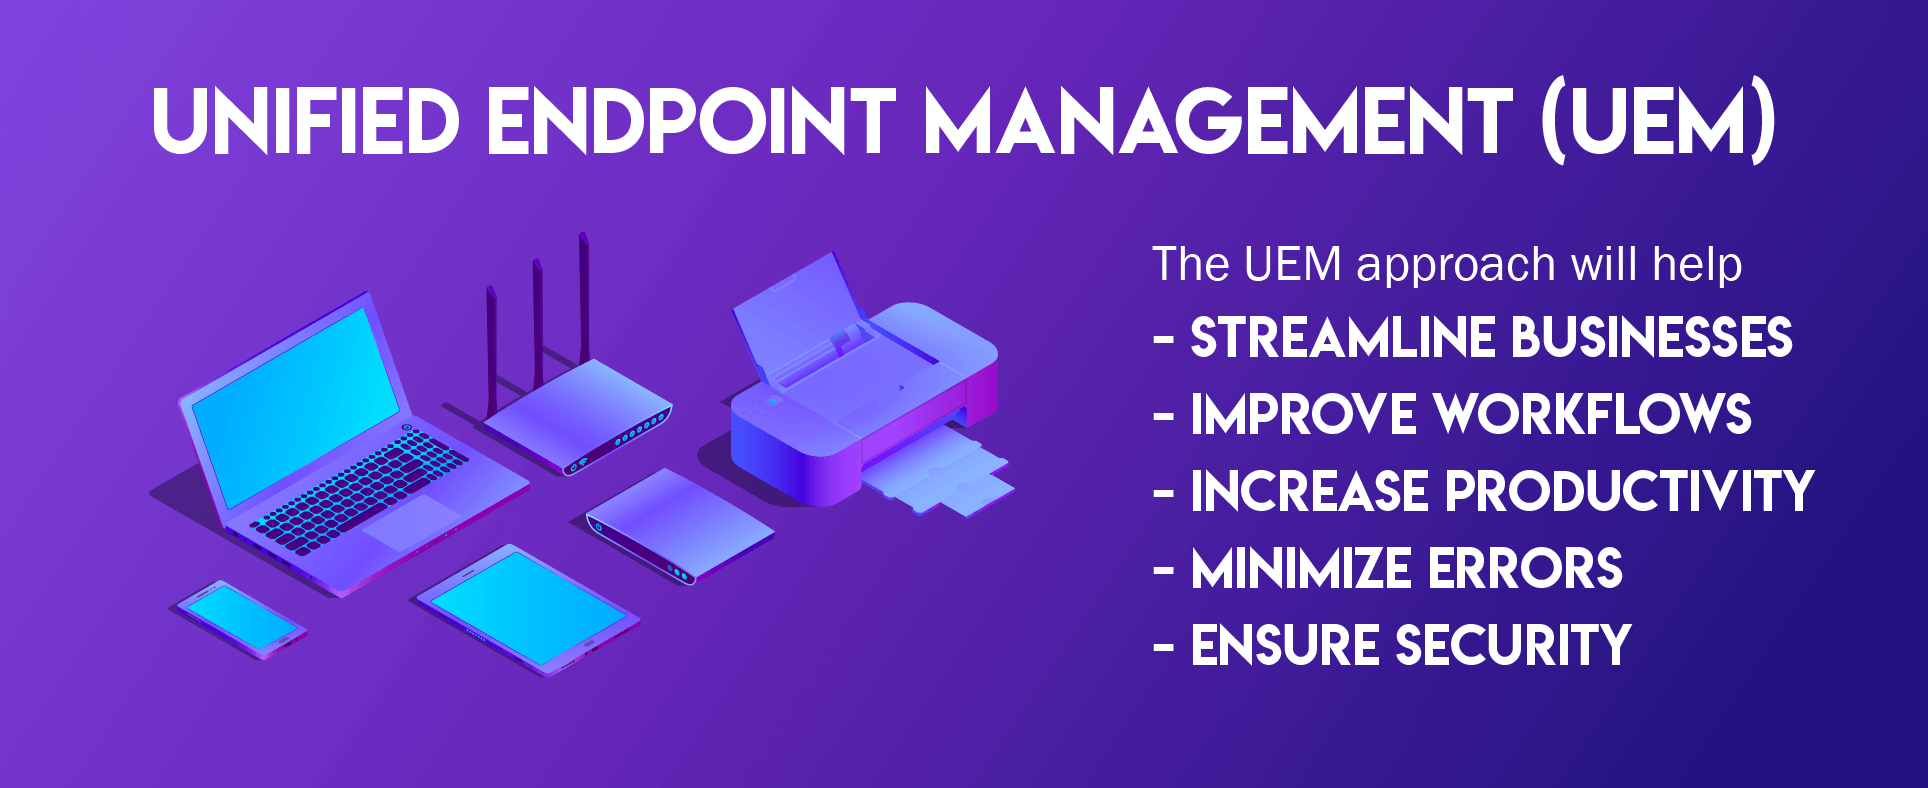 Enterprise Mobility Trends in 2019 - UEM